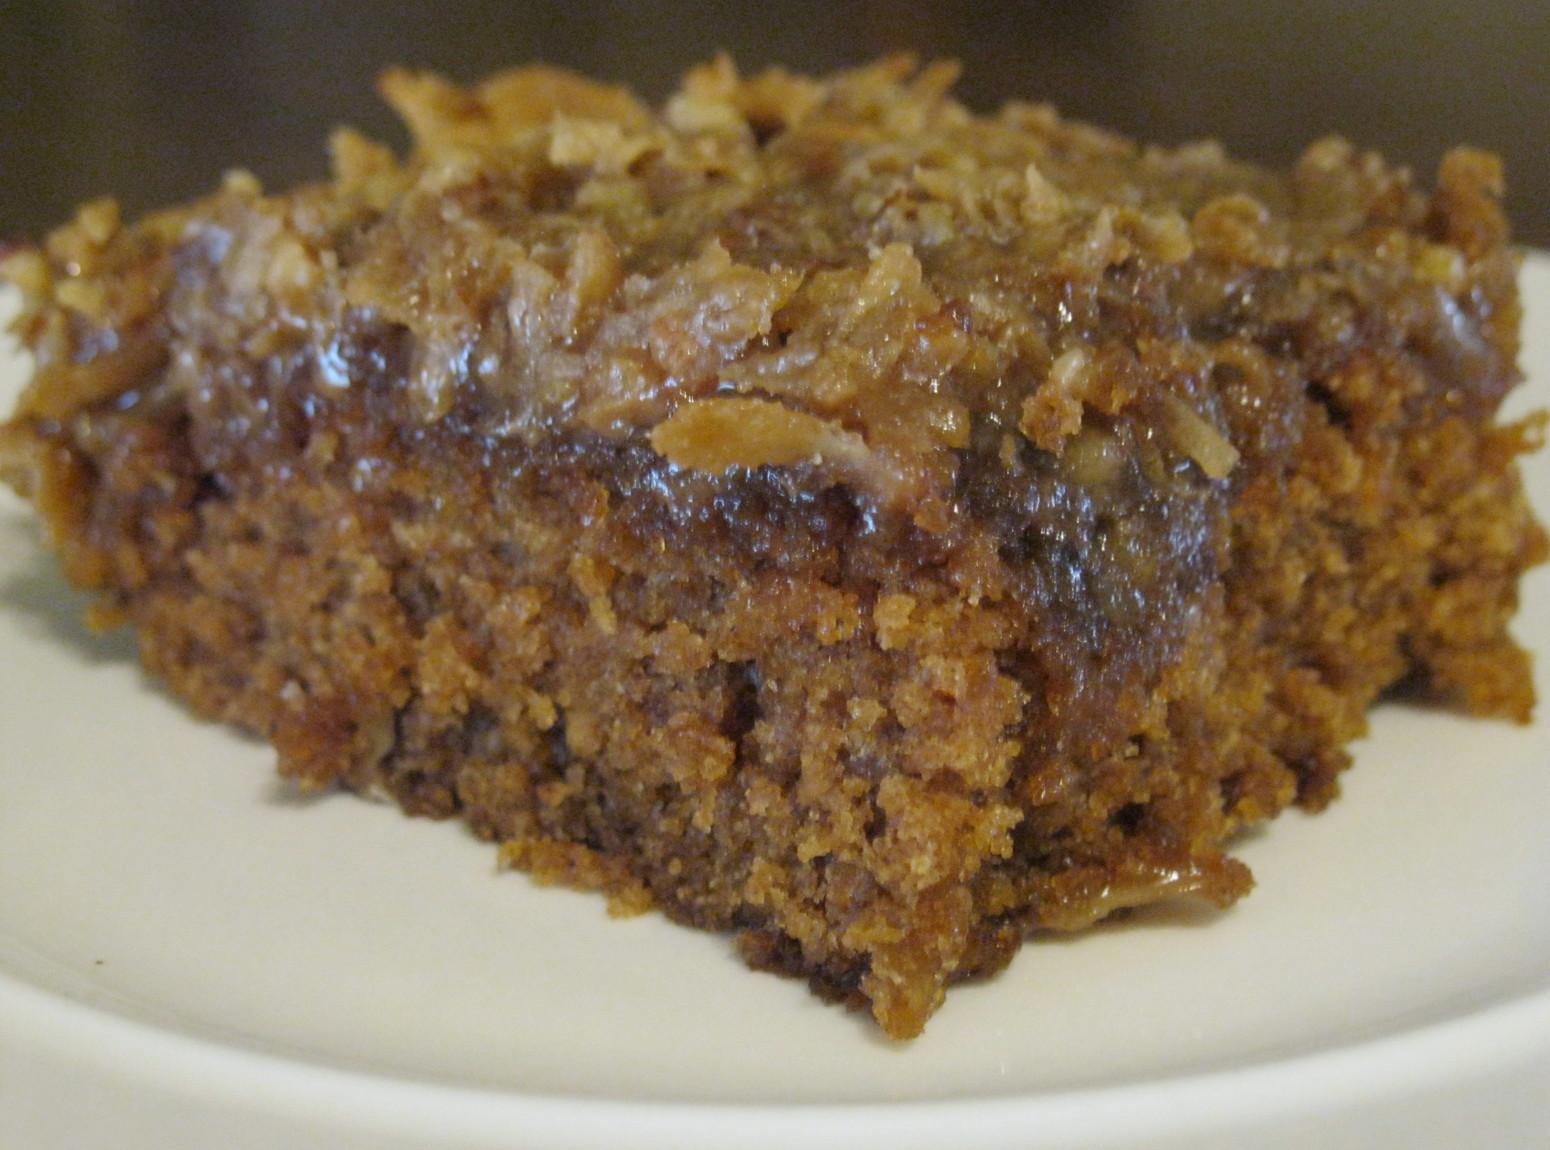 Oatmeal Dessert Recipes  Oatmeal Cake Recipe 12